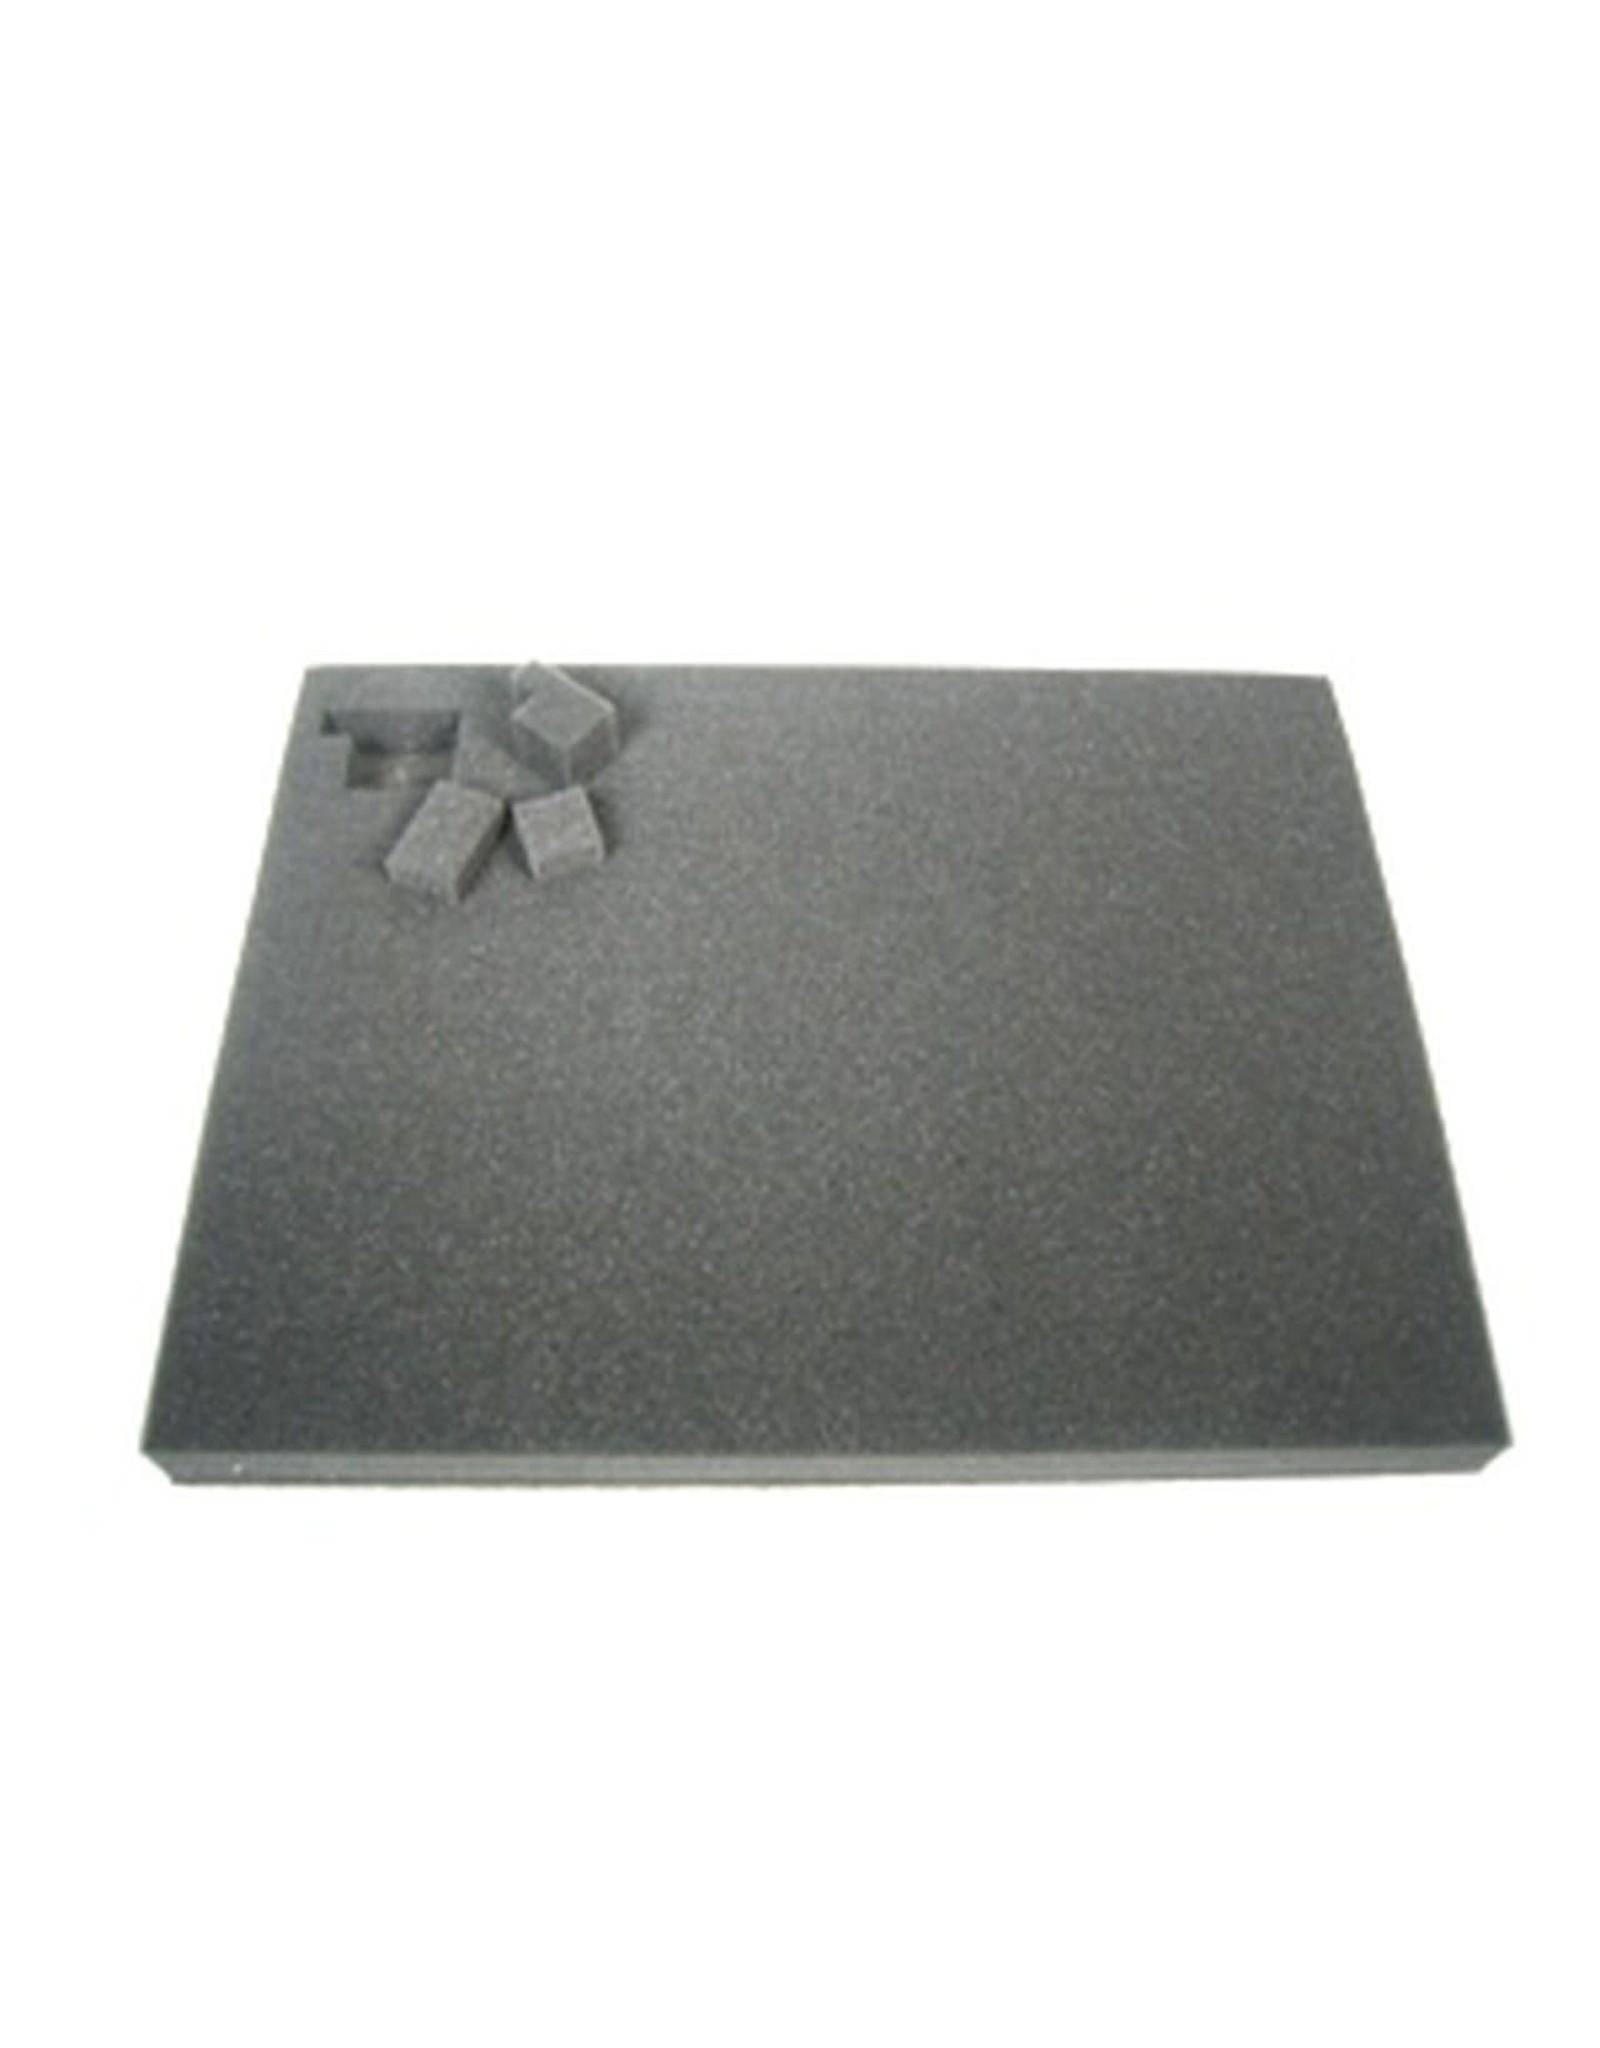 Battlefoam 2 Inch Pluck Foam Tray for the Shield/Spear Bag (GW) 14.25W x 10.25L x 2H